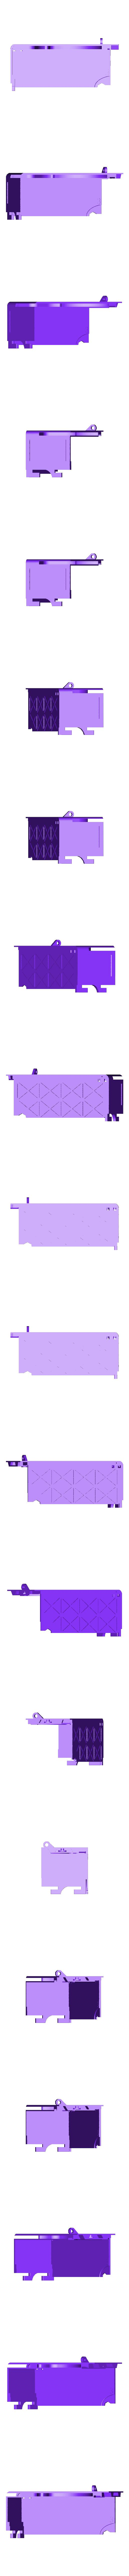 Cont liv 1 n3 con logo mikifly.stl Download STL file Multiple container ( closed 180x370mm) construction Contenitore multipla trasportabile Multibox • 3D printable design, mikifly10